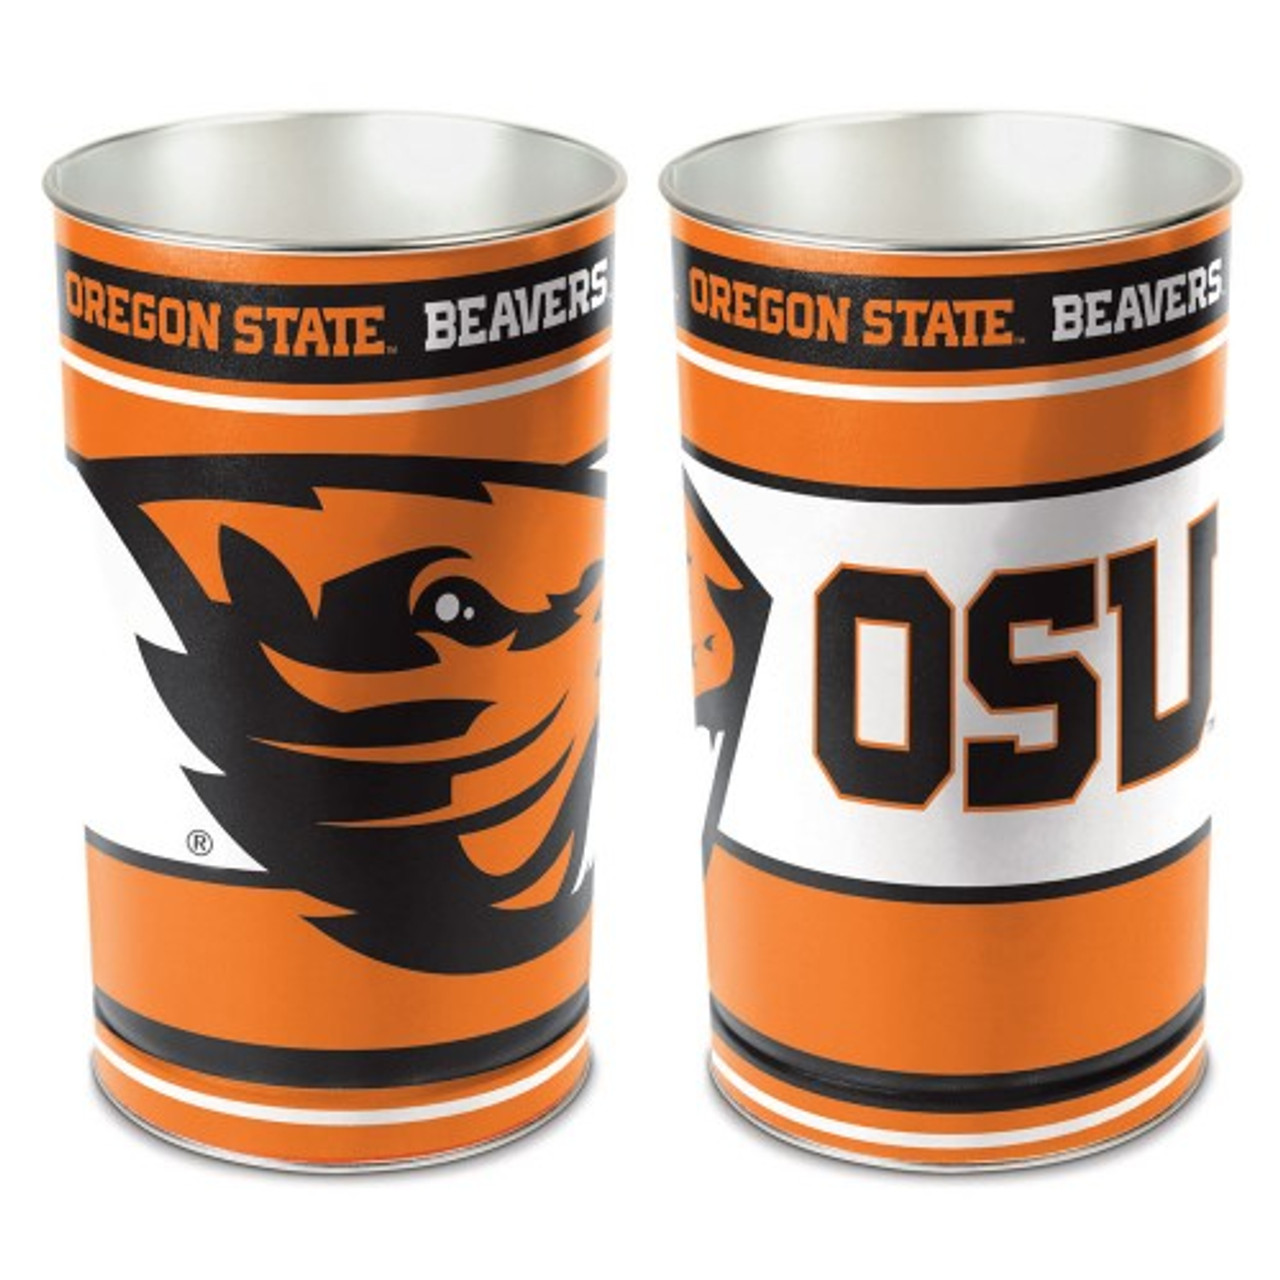 Oregon State Beavers Wastebasket 15 Inch Special Order